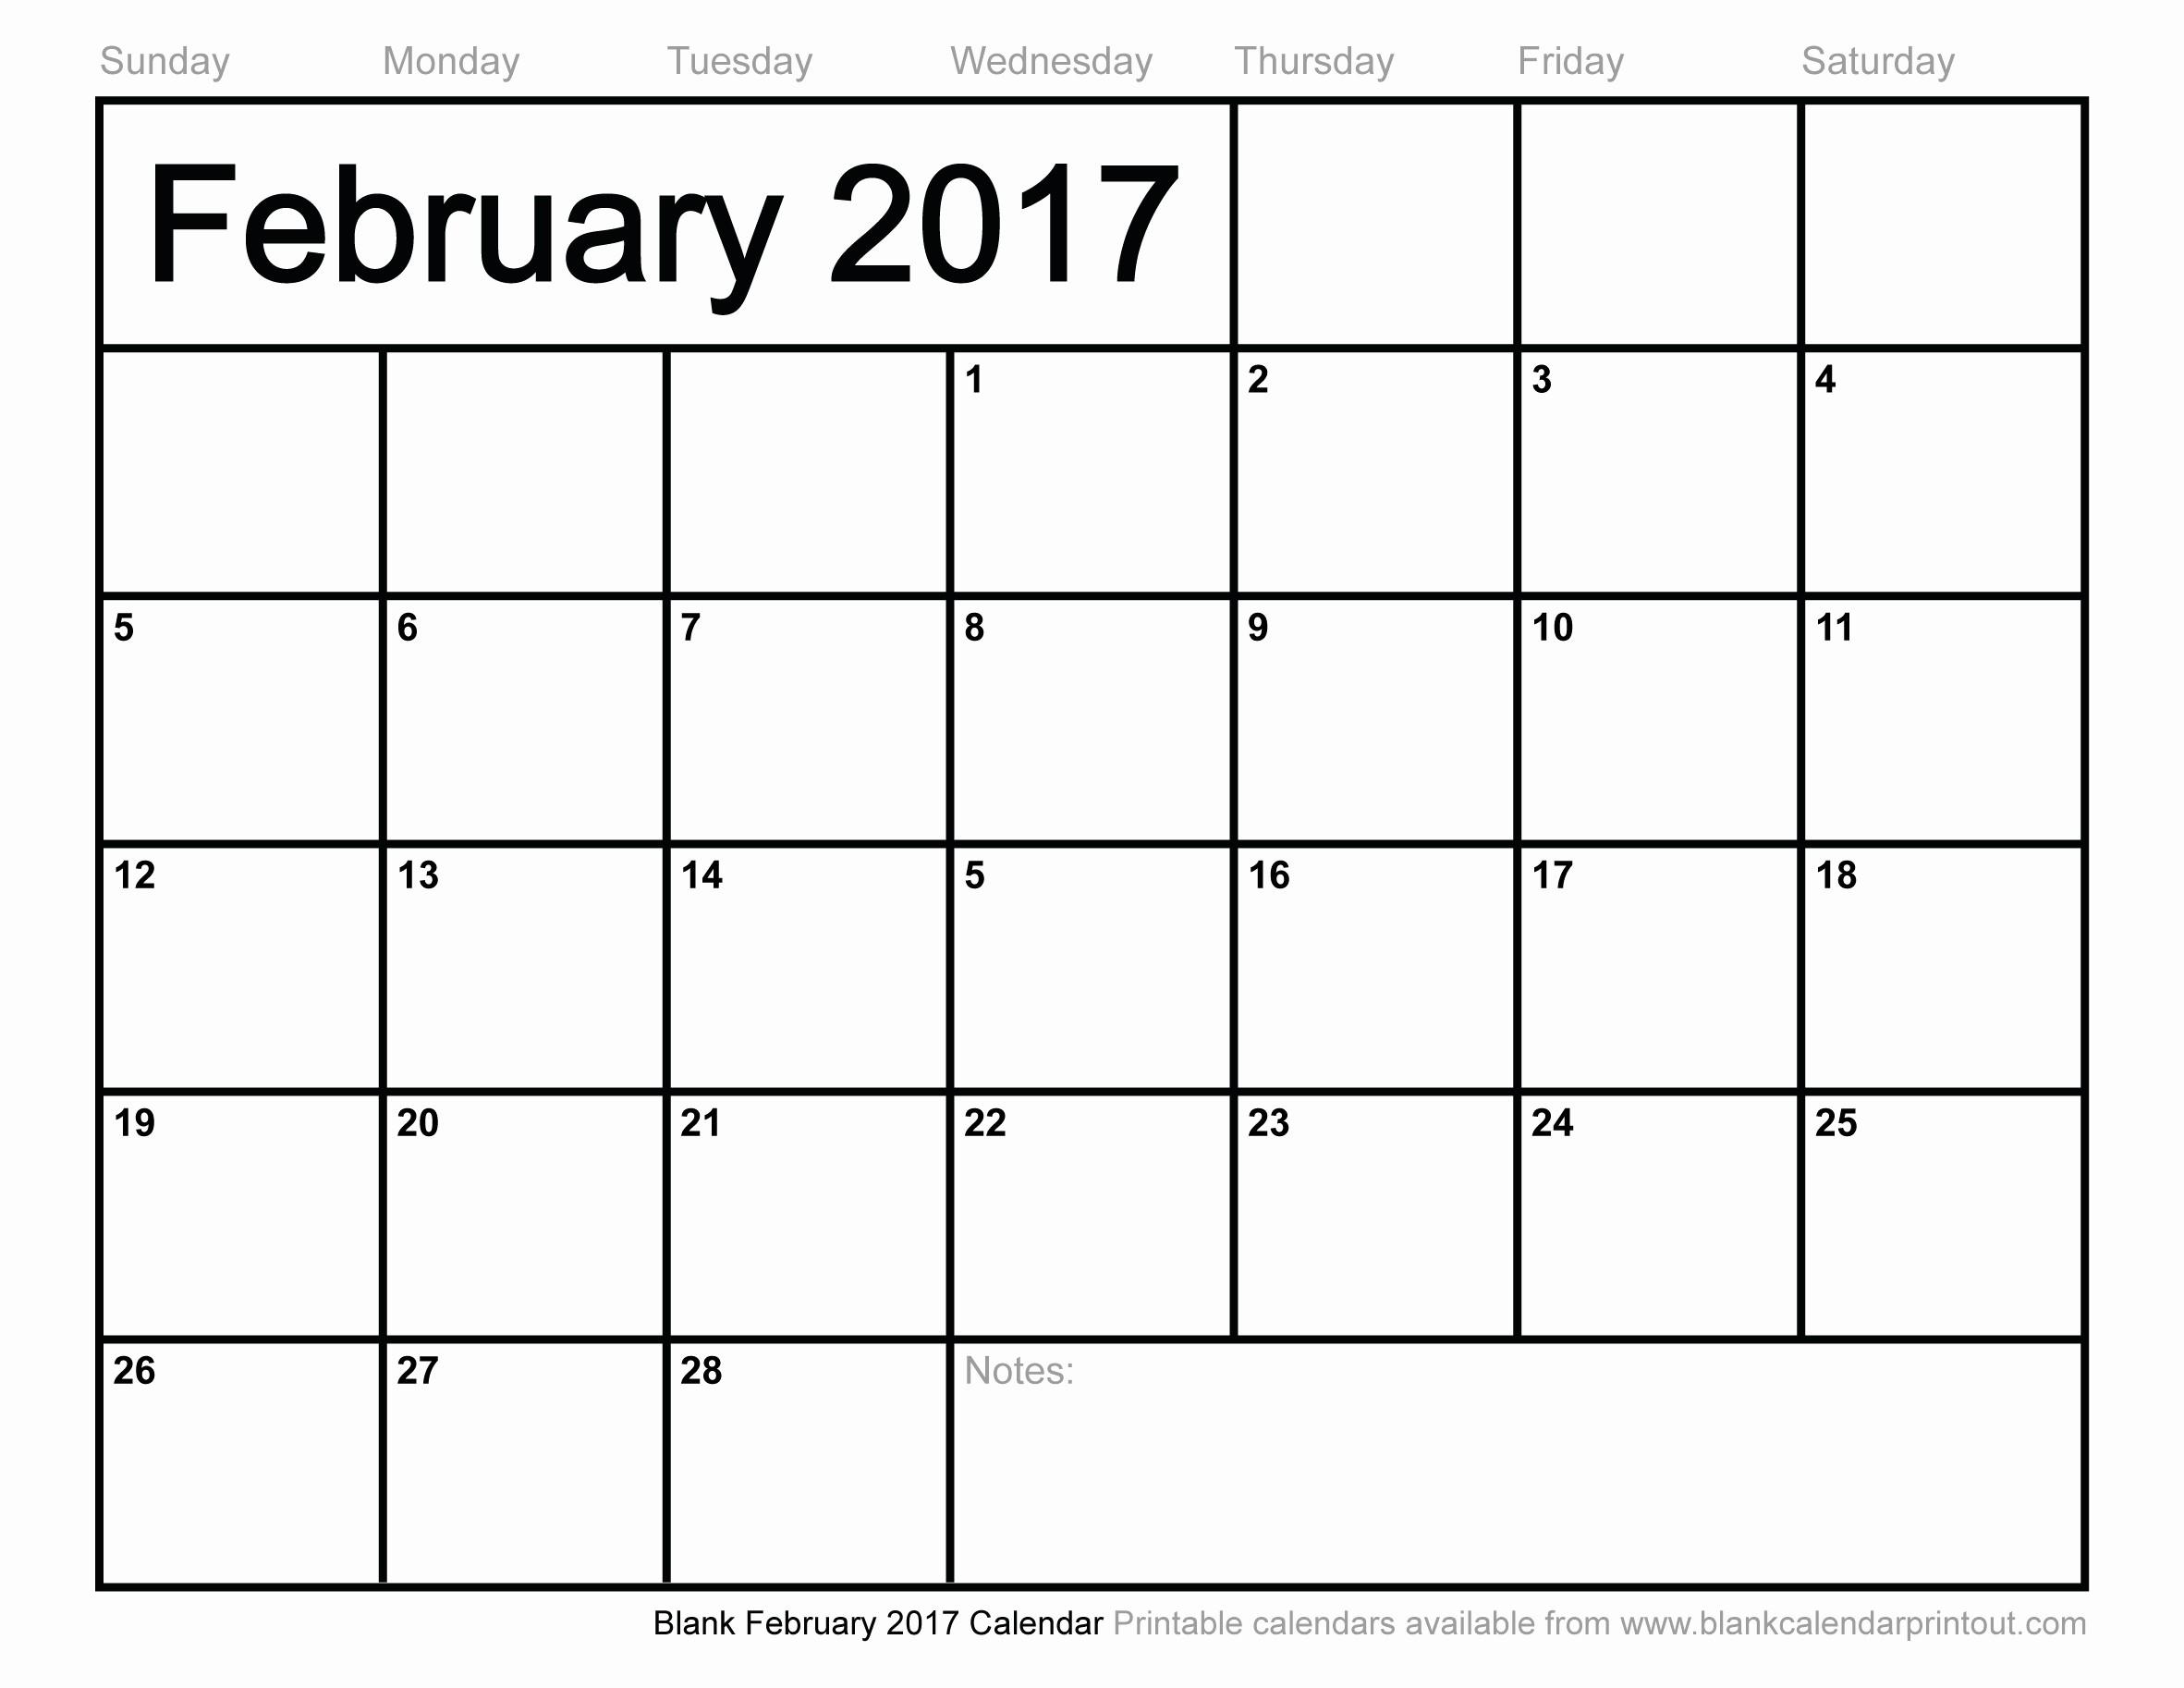 Blank Monthly Calendar 2017 Printable Lovely Blank February 2017 Calendar to Print